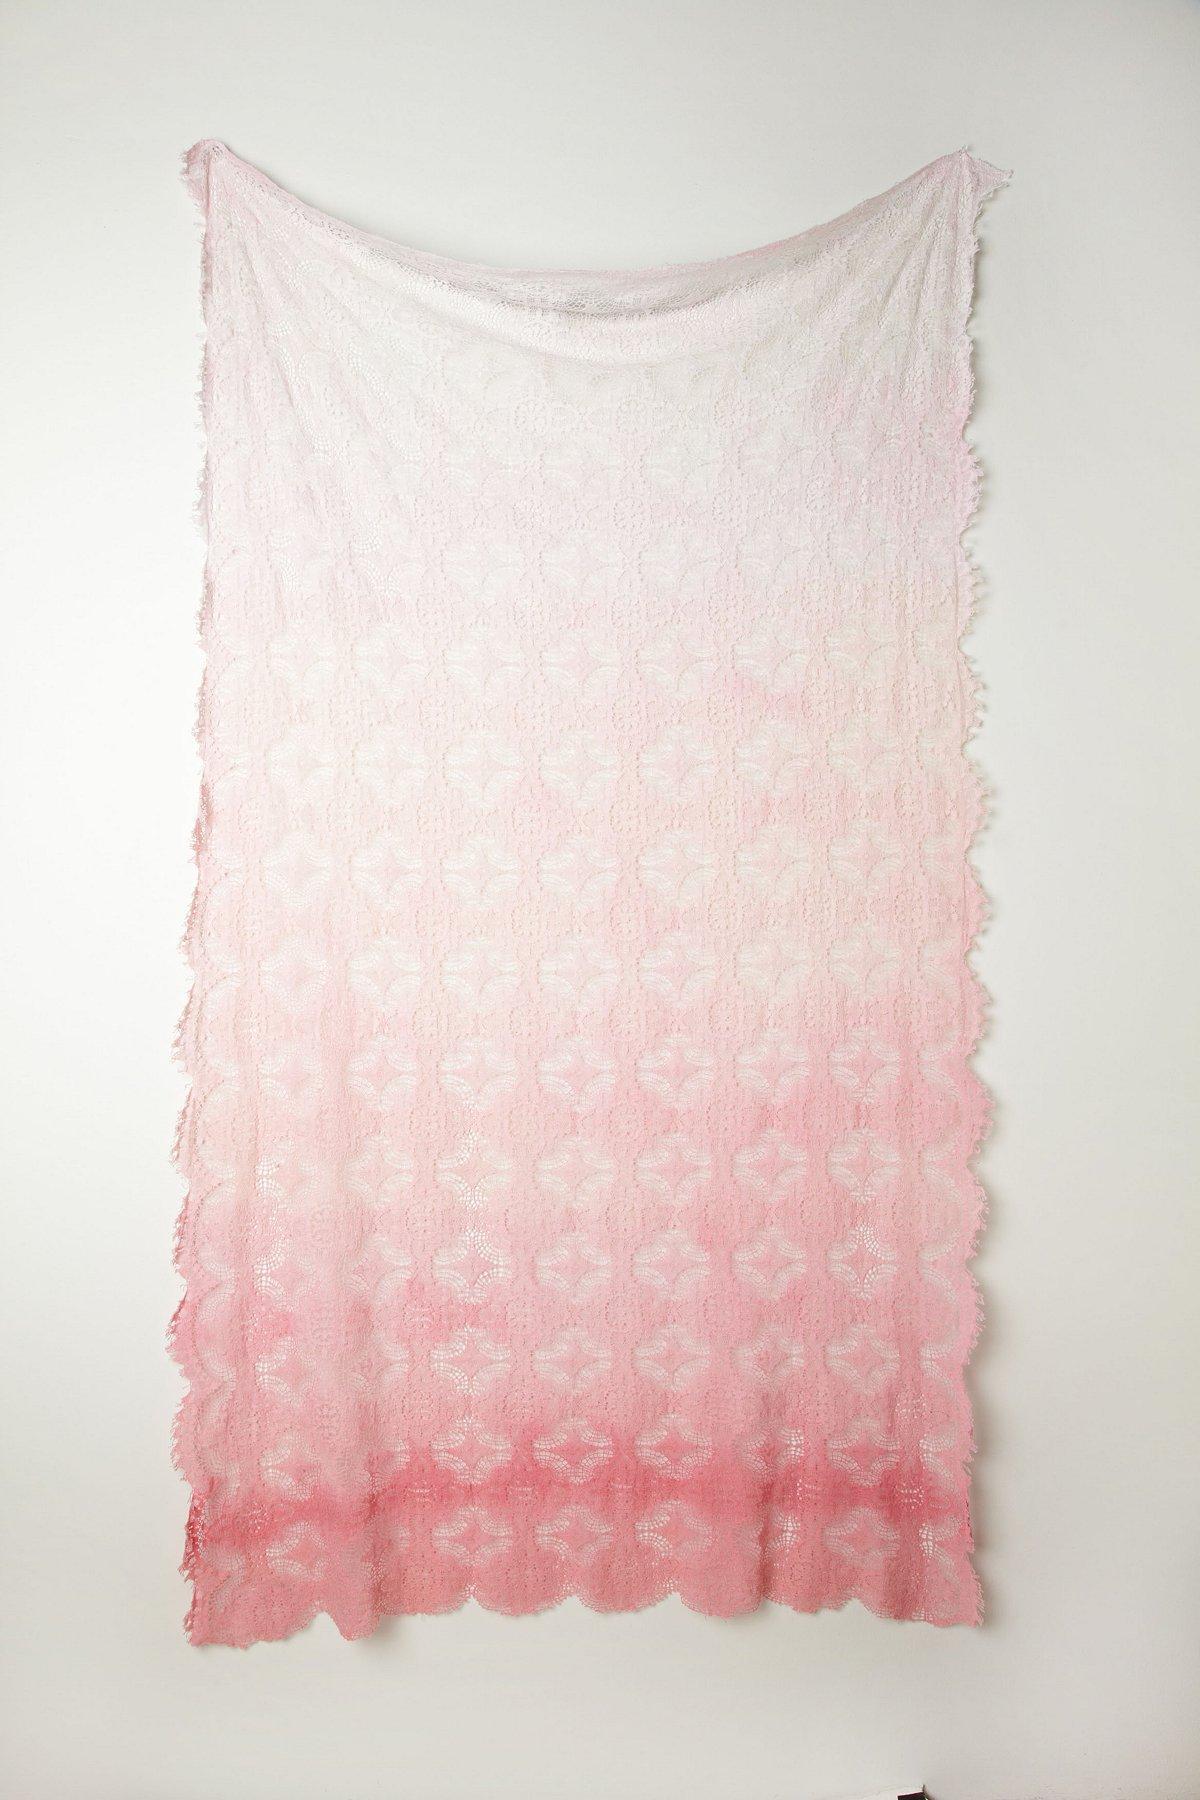 Dip Dye Lace Throw